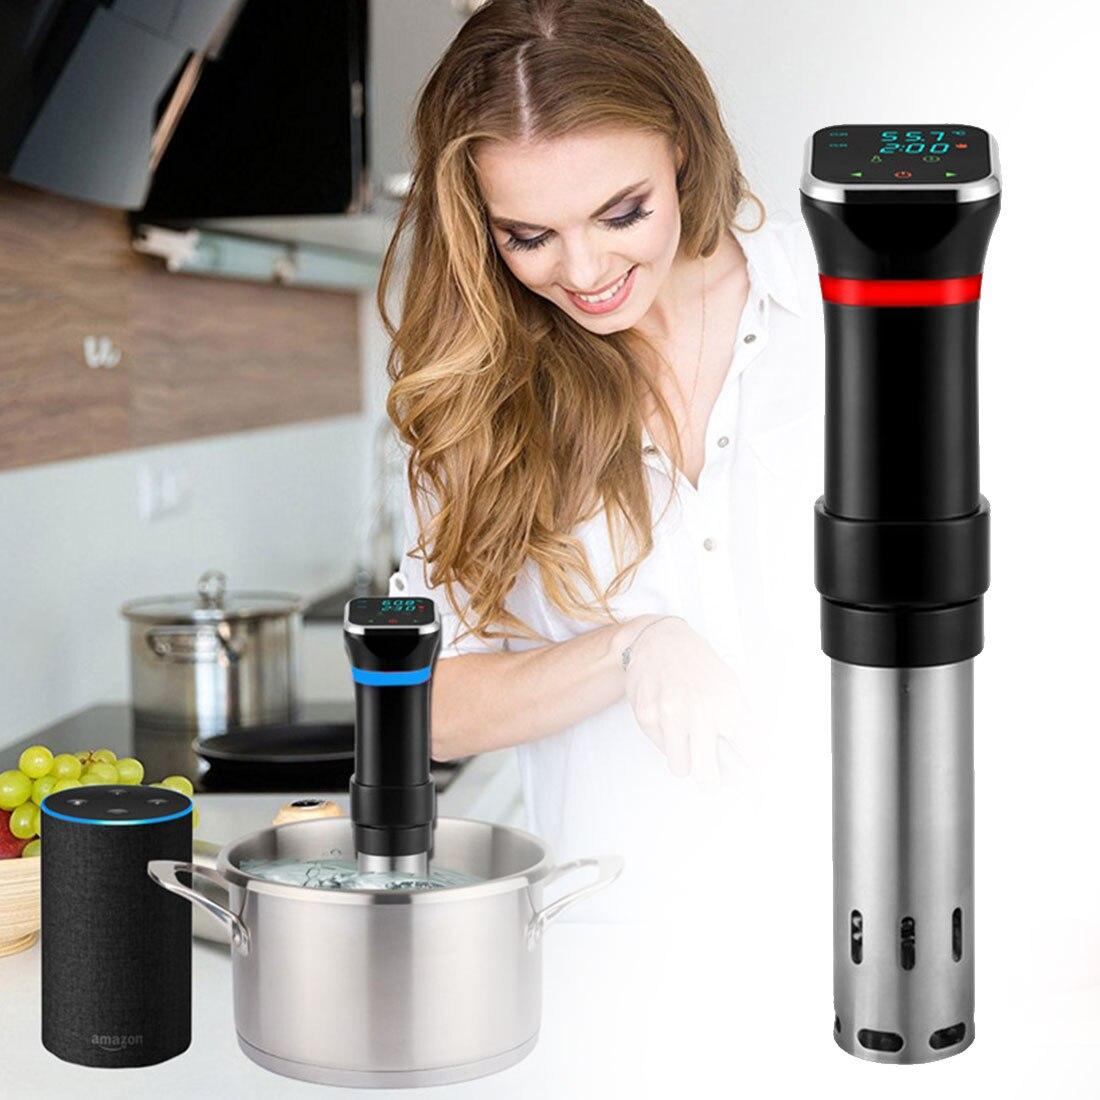 LCD فراغ الغذاء Sous فيديو طباخ 1100 واط IPX7 مقاوم للماء قوي الغمر دائري بطيئة طباخ ماكينة طهي دقيقة